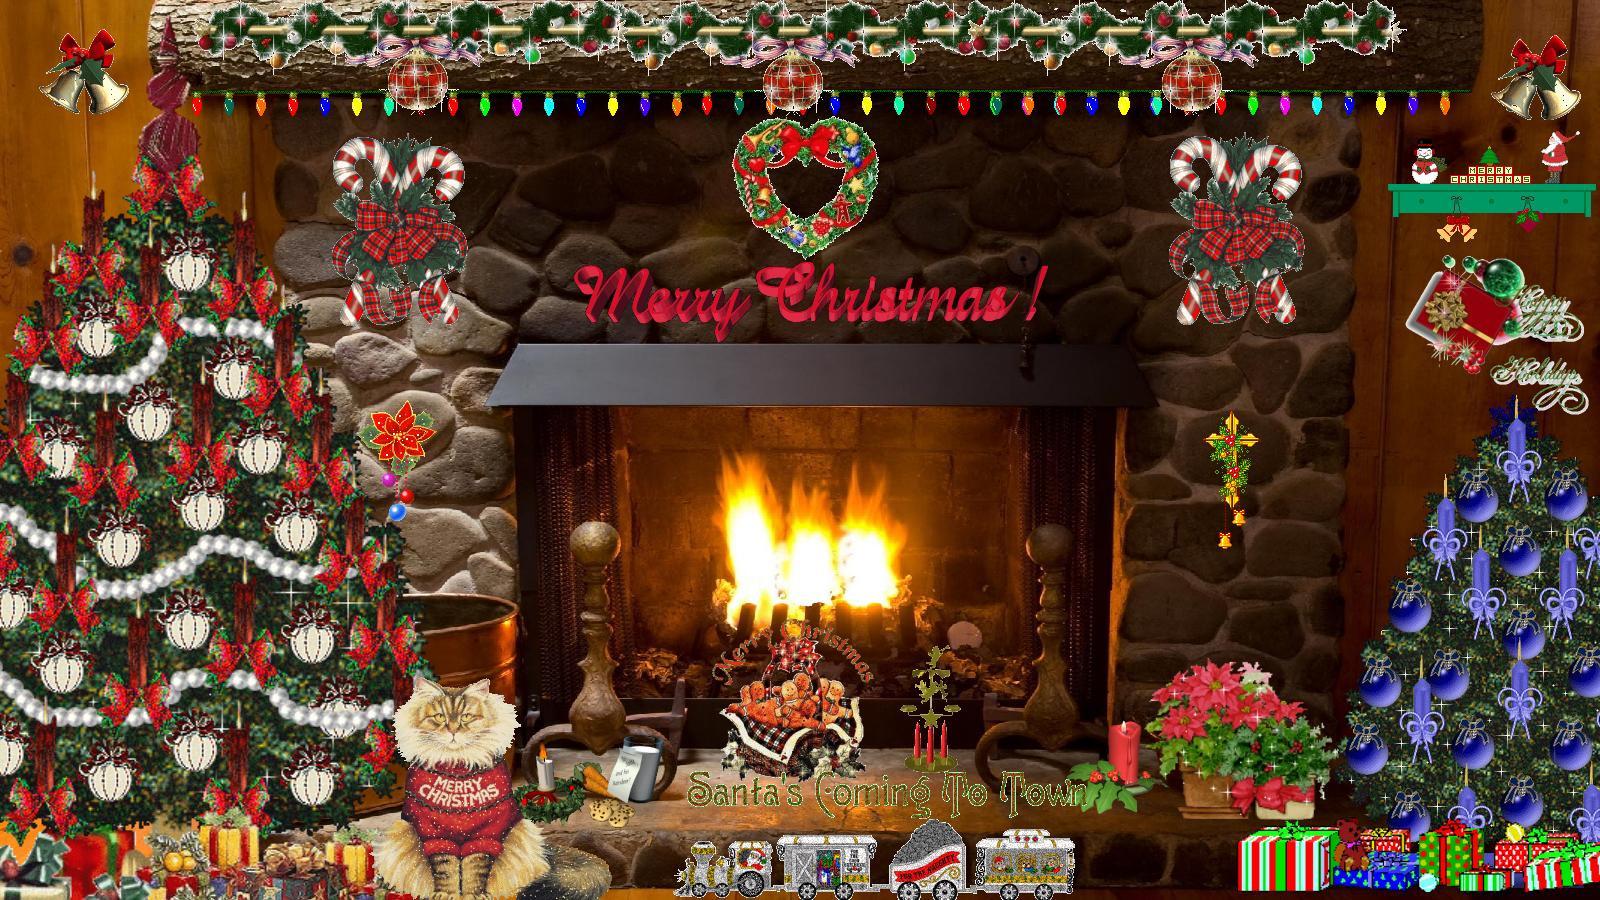 Free Christmas Fireplace Screensaver  Dreamscapes Animated Wallpaper WallpaperSafari